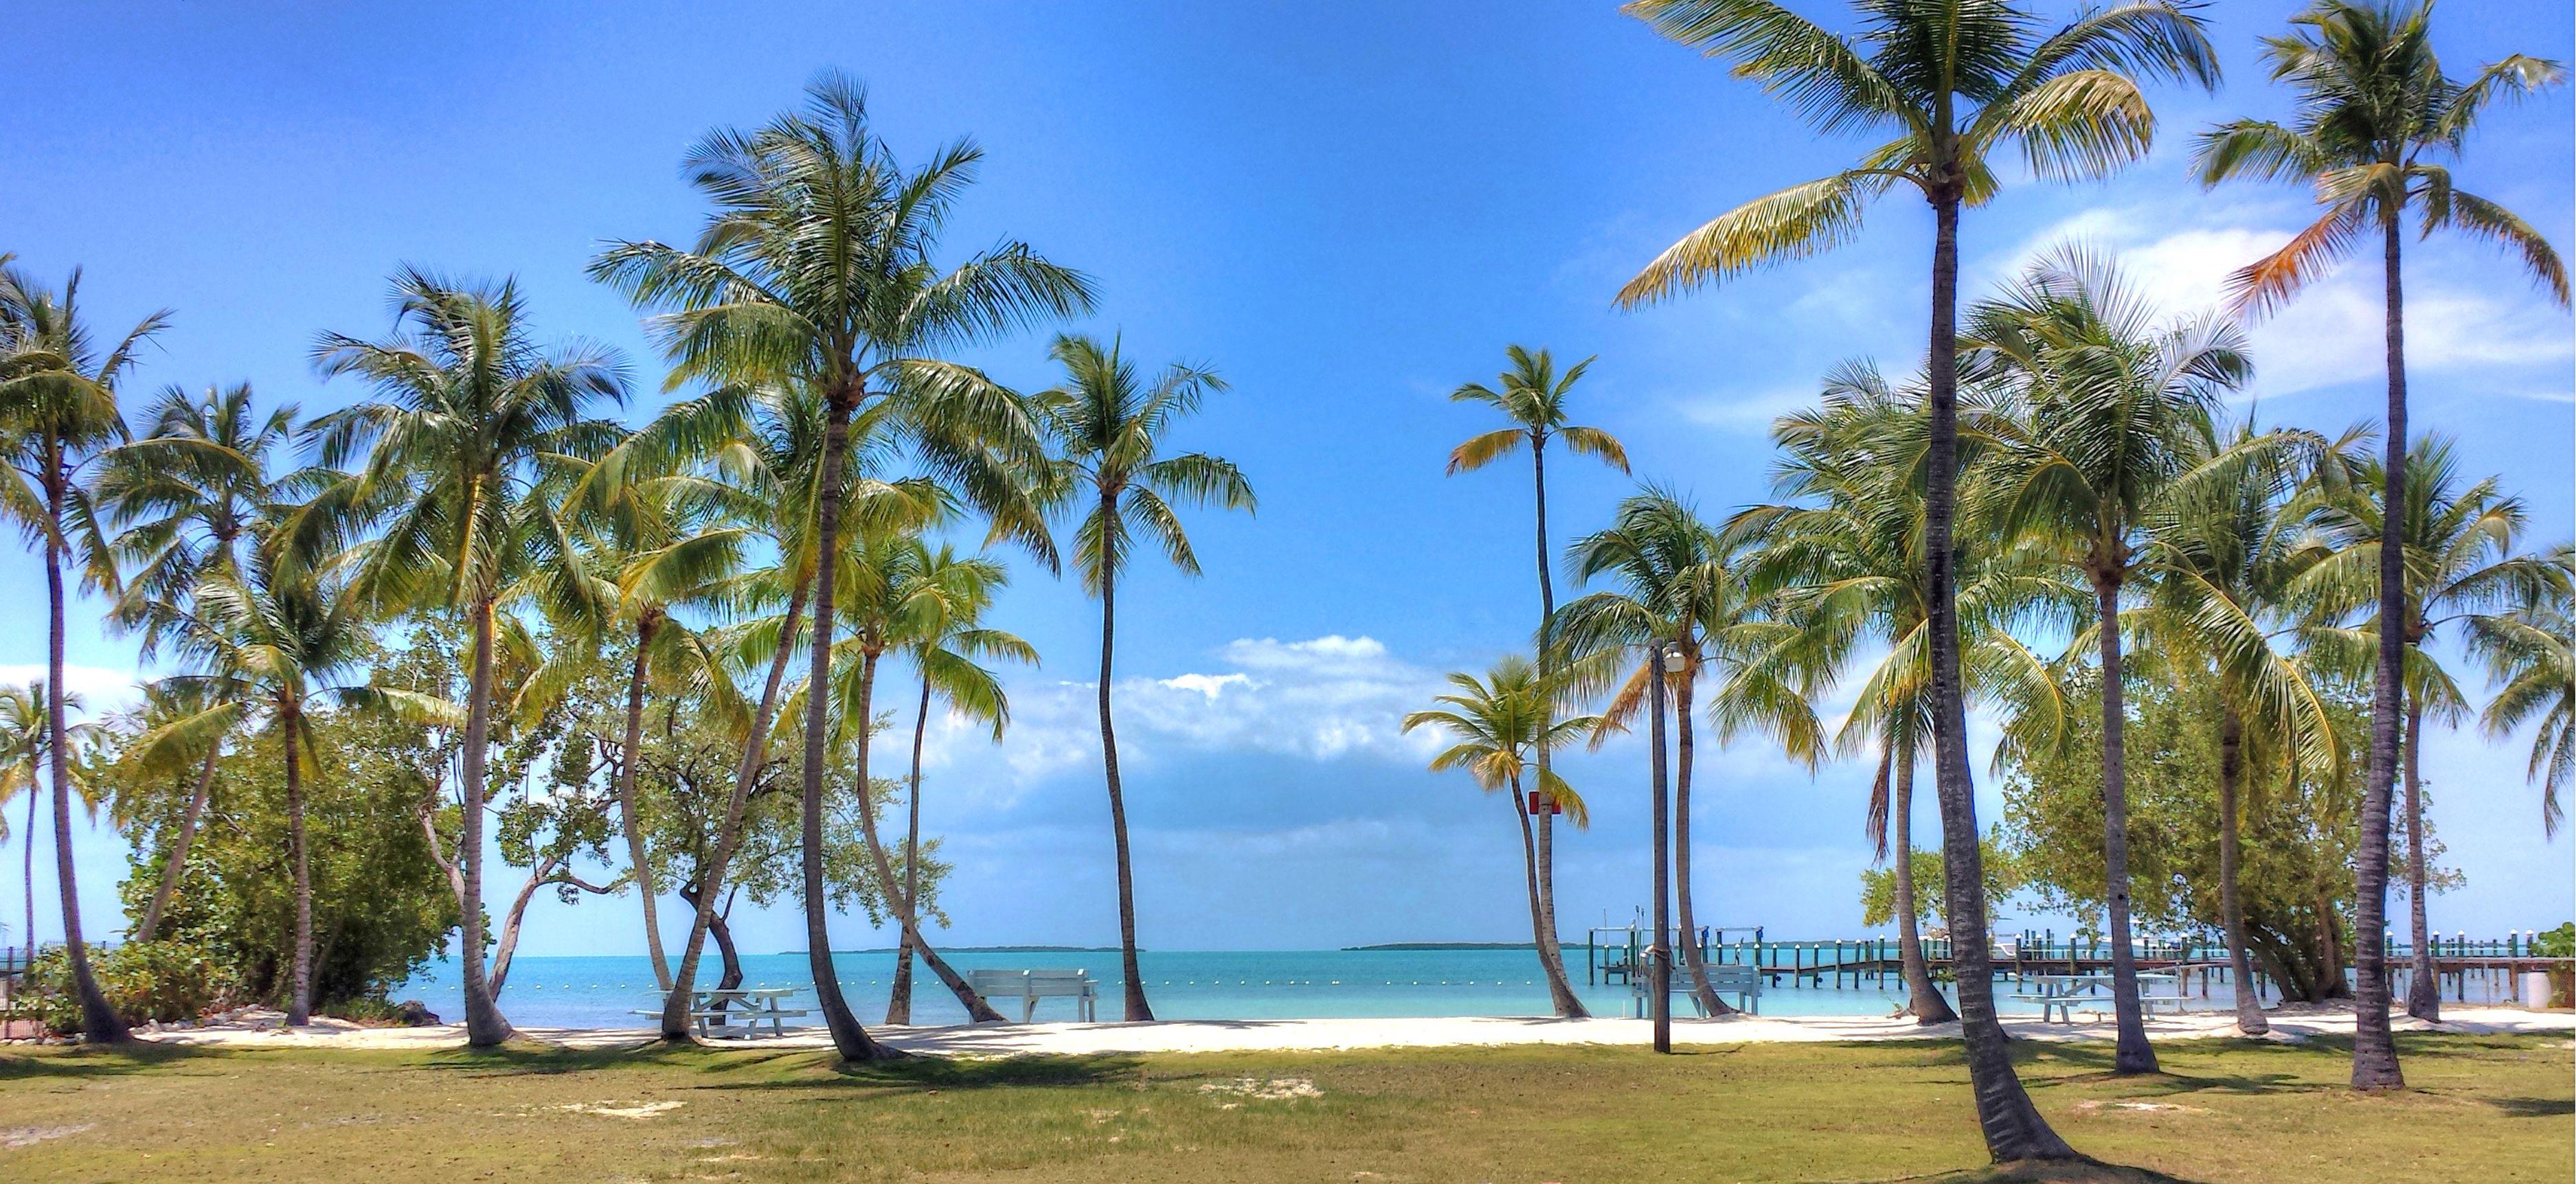 Key Largo Private Beach